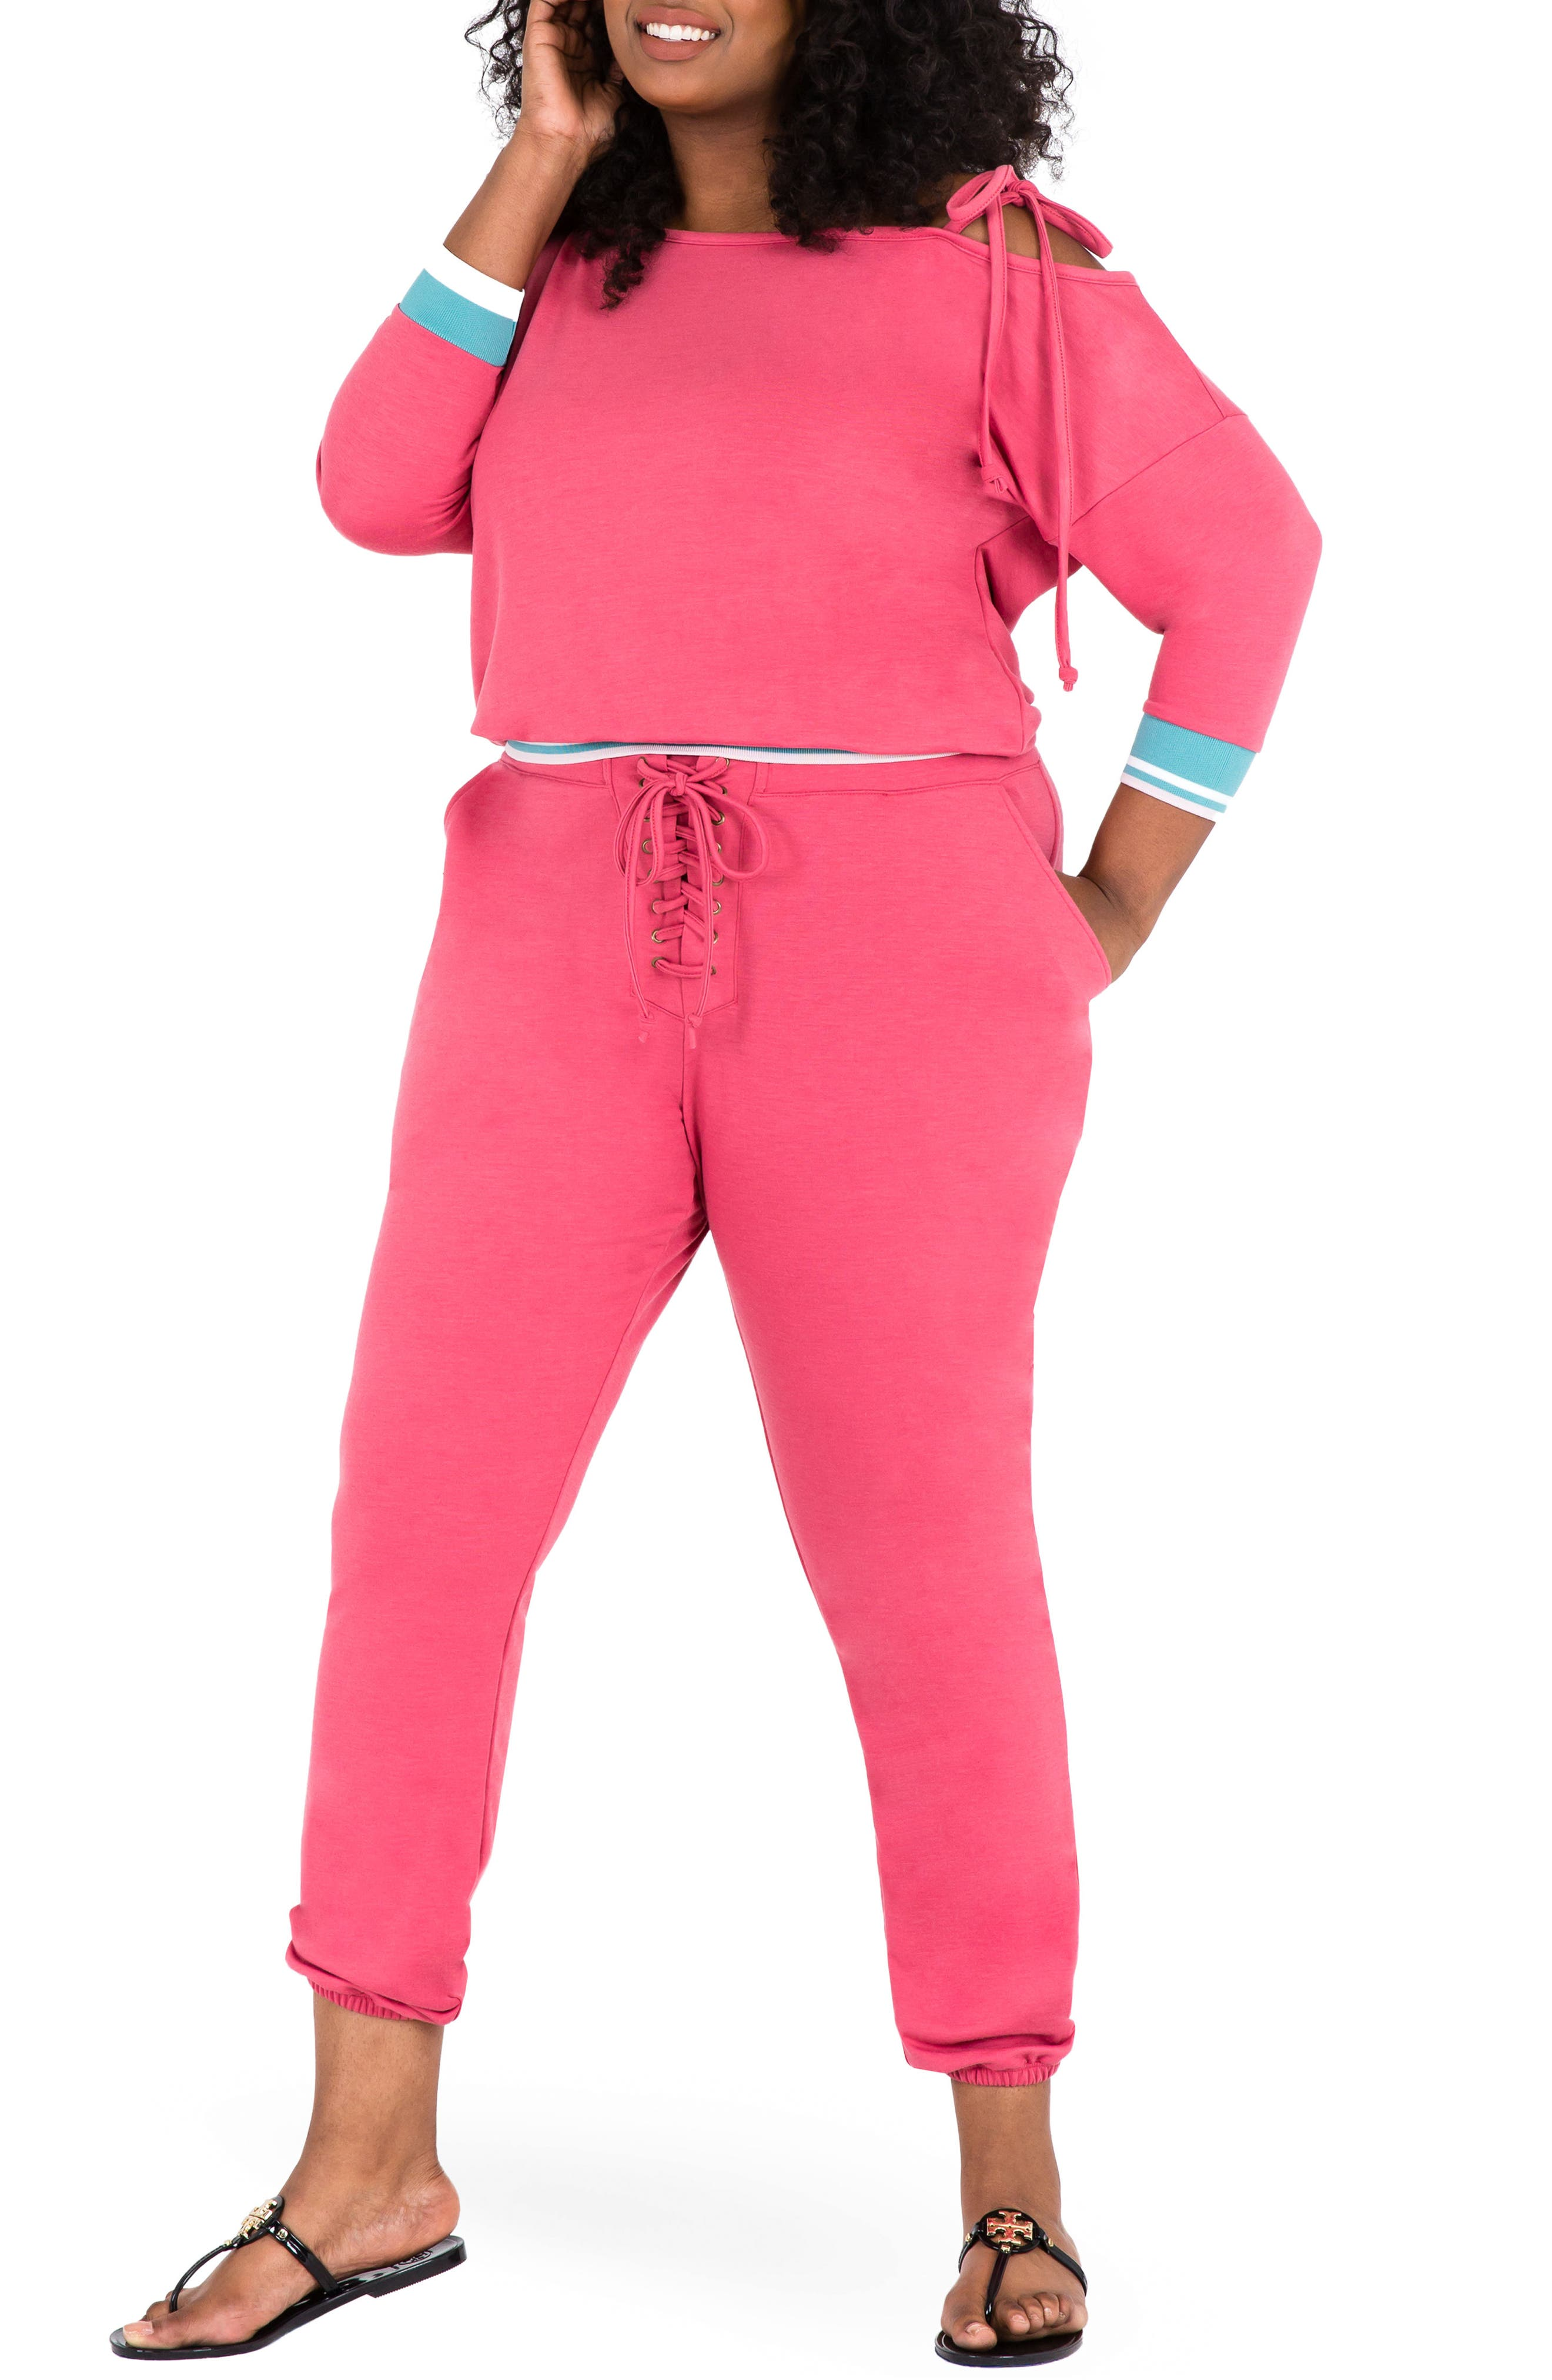 Janae Convertible Knit Top,                             Alternate thumbnail 4, color,                             Deep Rose Pink